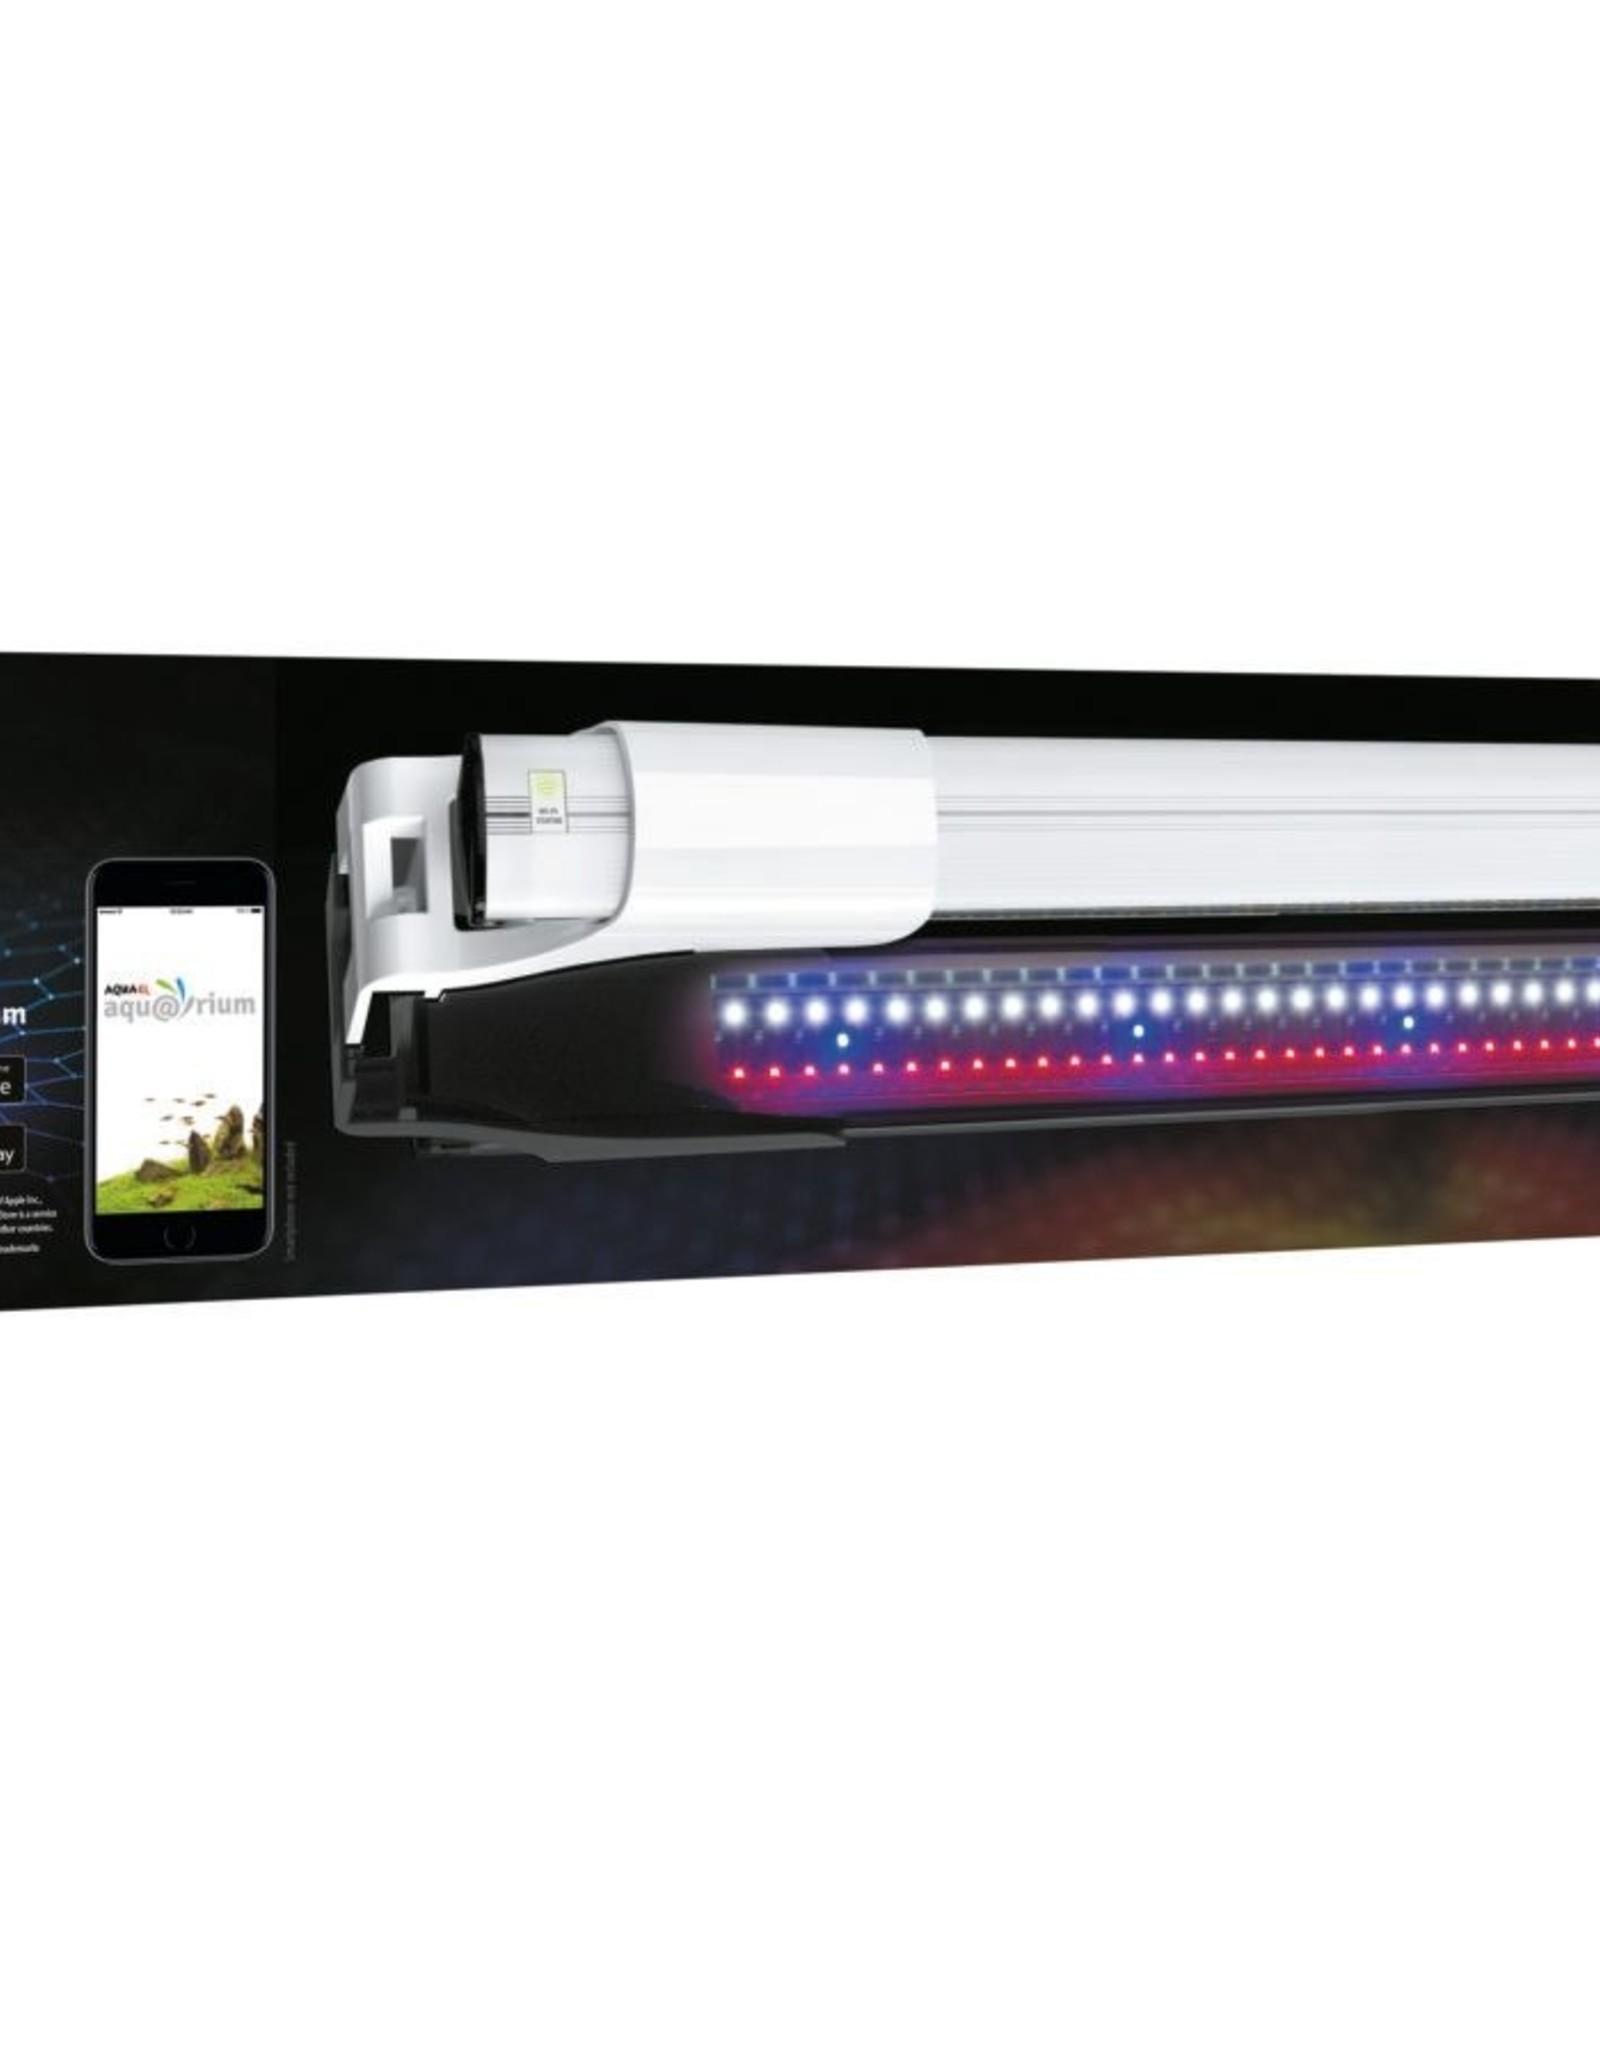 AquaEl ECL LEDDY SLIM LINK BLANC 36w pr.aqua.100-120cm